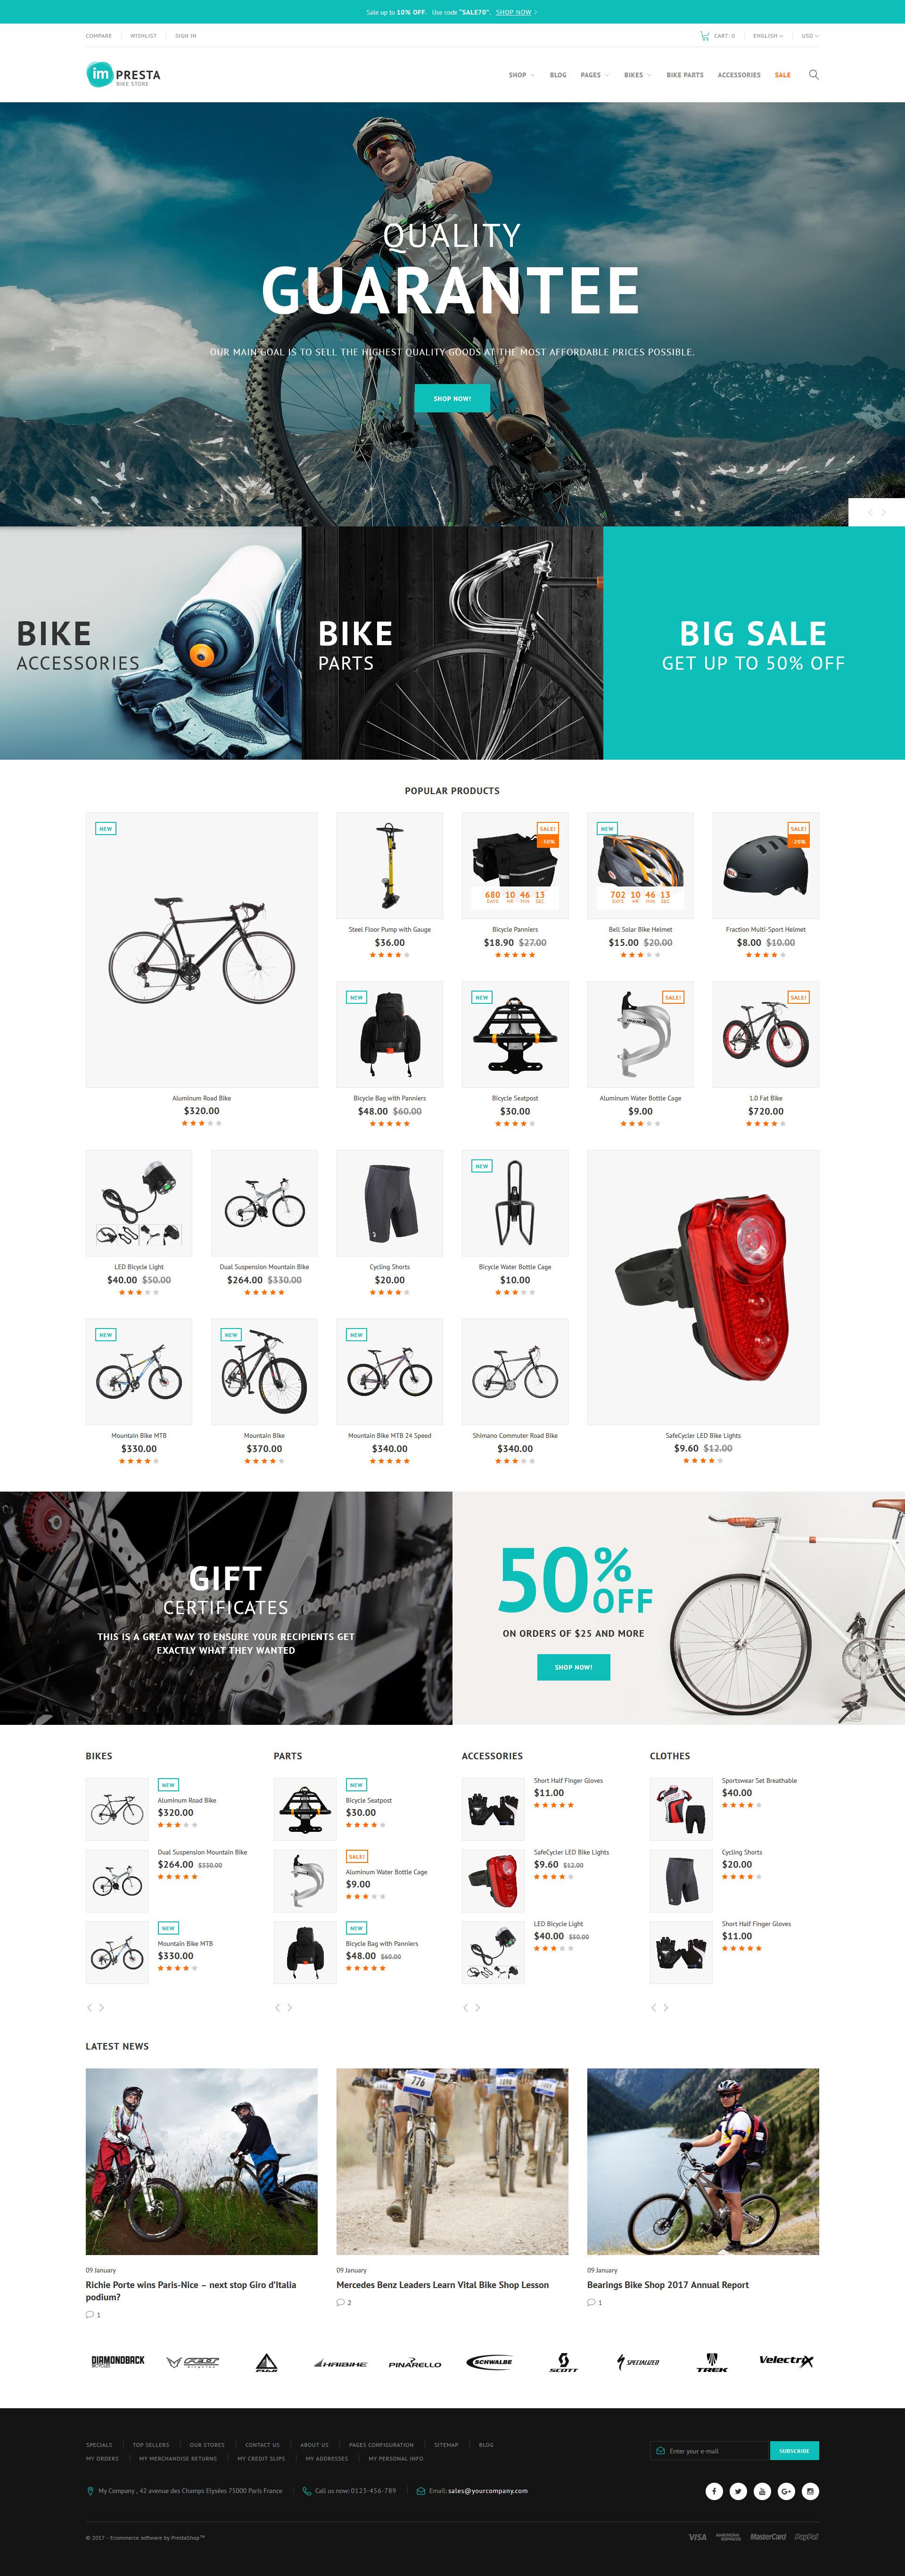 """Impresta - Bike Store"" 响应式PrestaShop模板 #64382 - 截图"